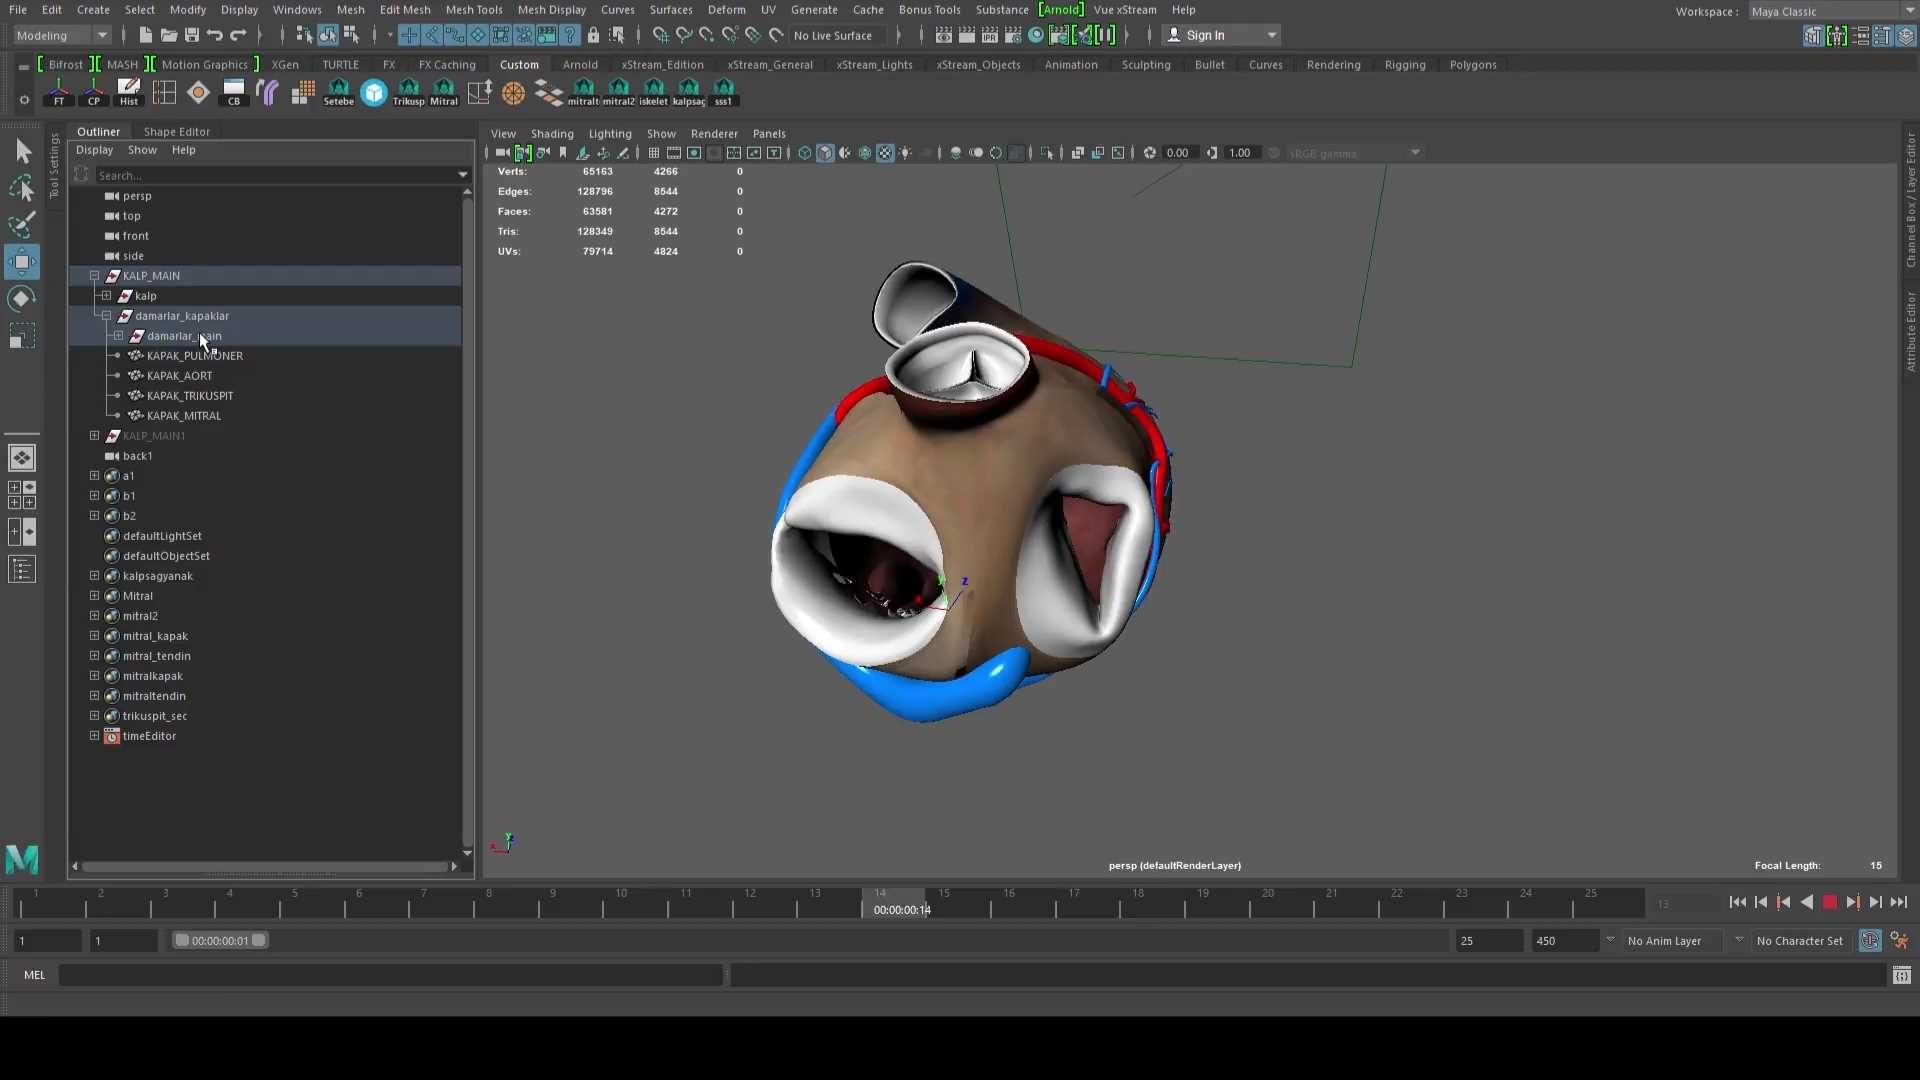 kalb2 1920x1080 - İnsan kalbi medikal animasyon projesi